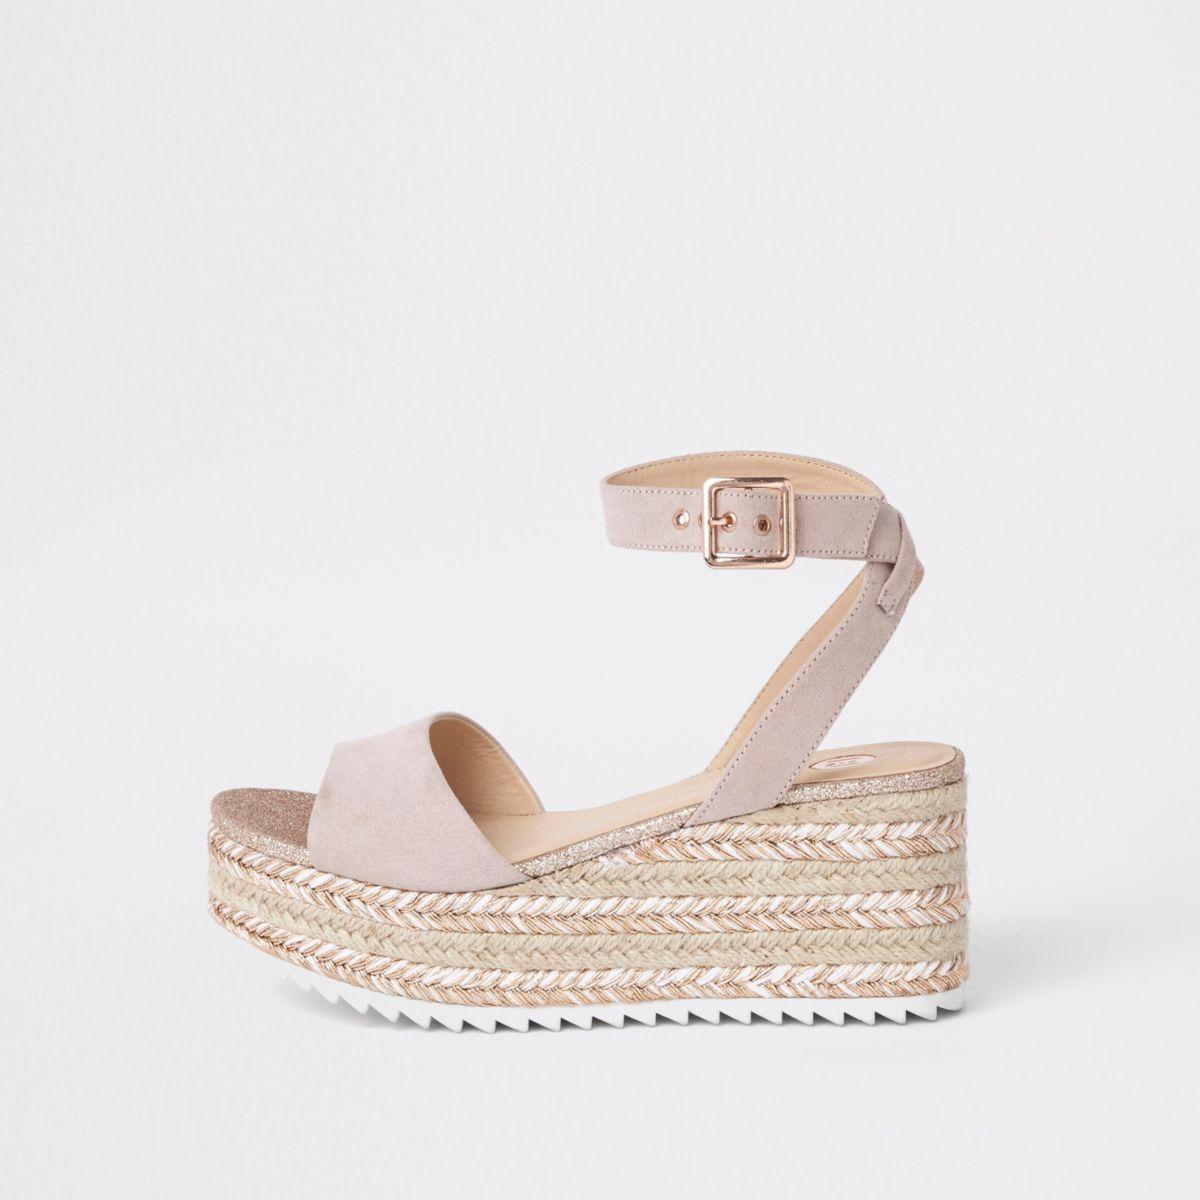 1a2331d2e Shoptagr | Gold Glitter Espadrille Platform Sandals by River Island